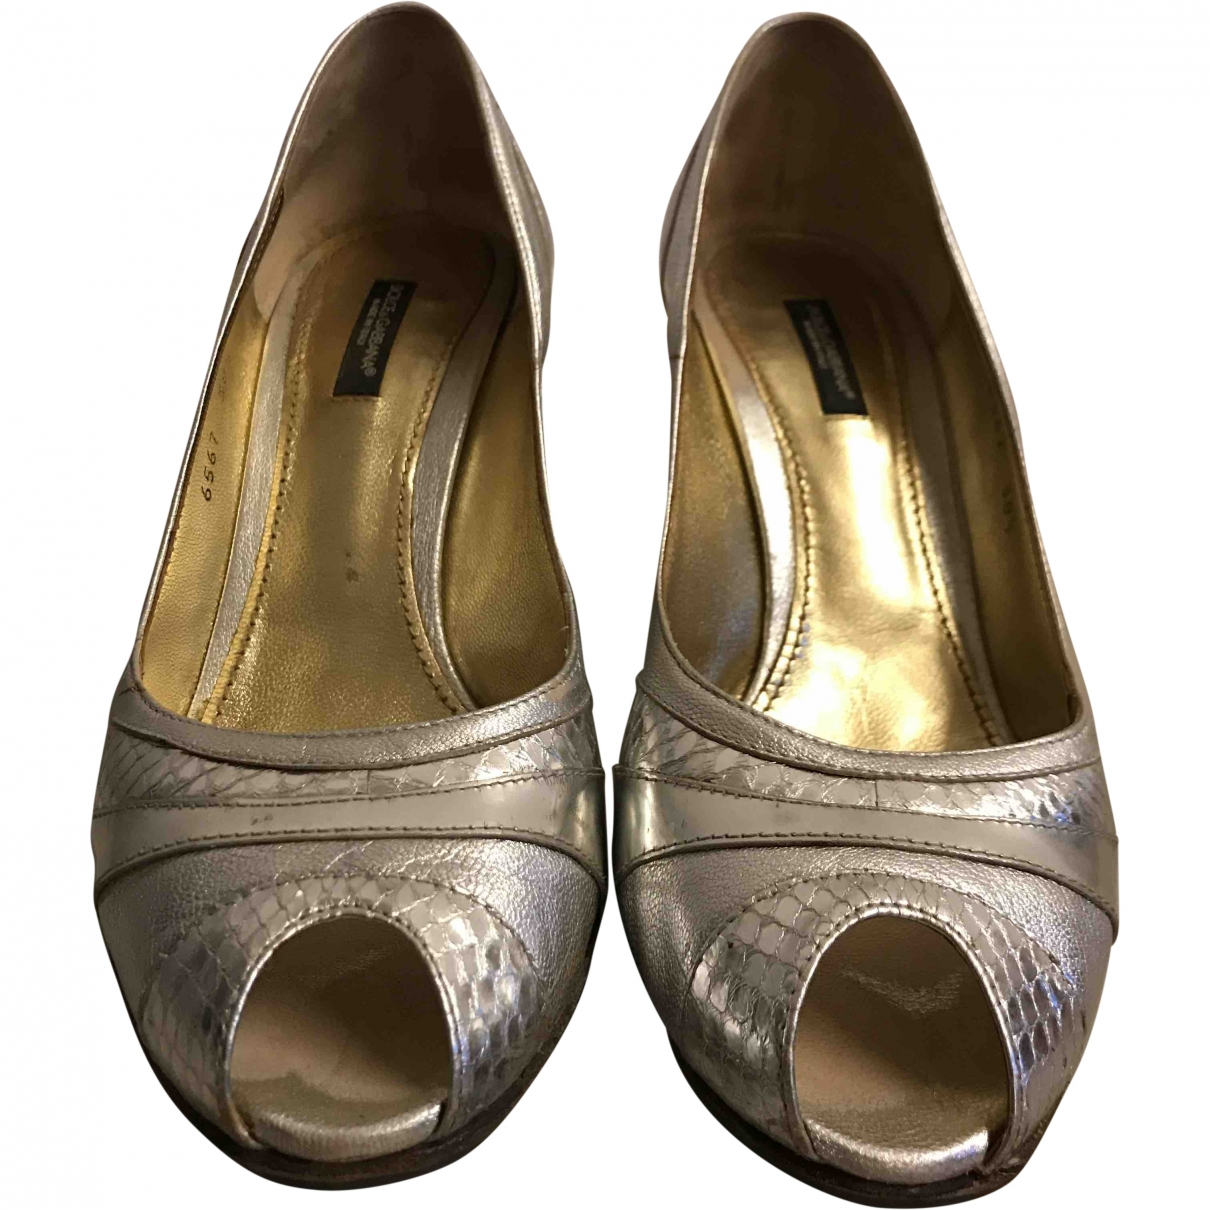 Dolce & Gabbana \N Silver Leather Heels for Women 38.5 EU